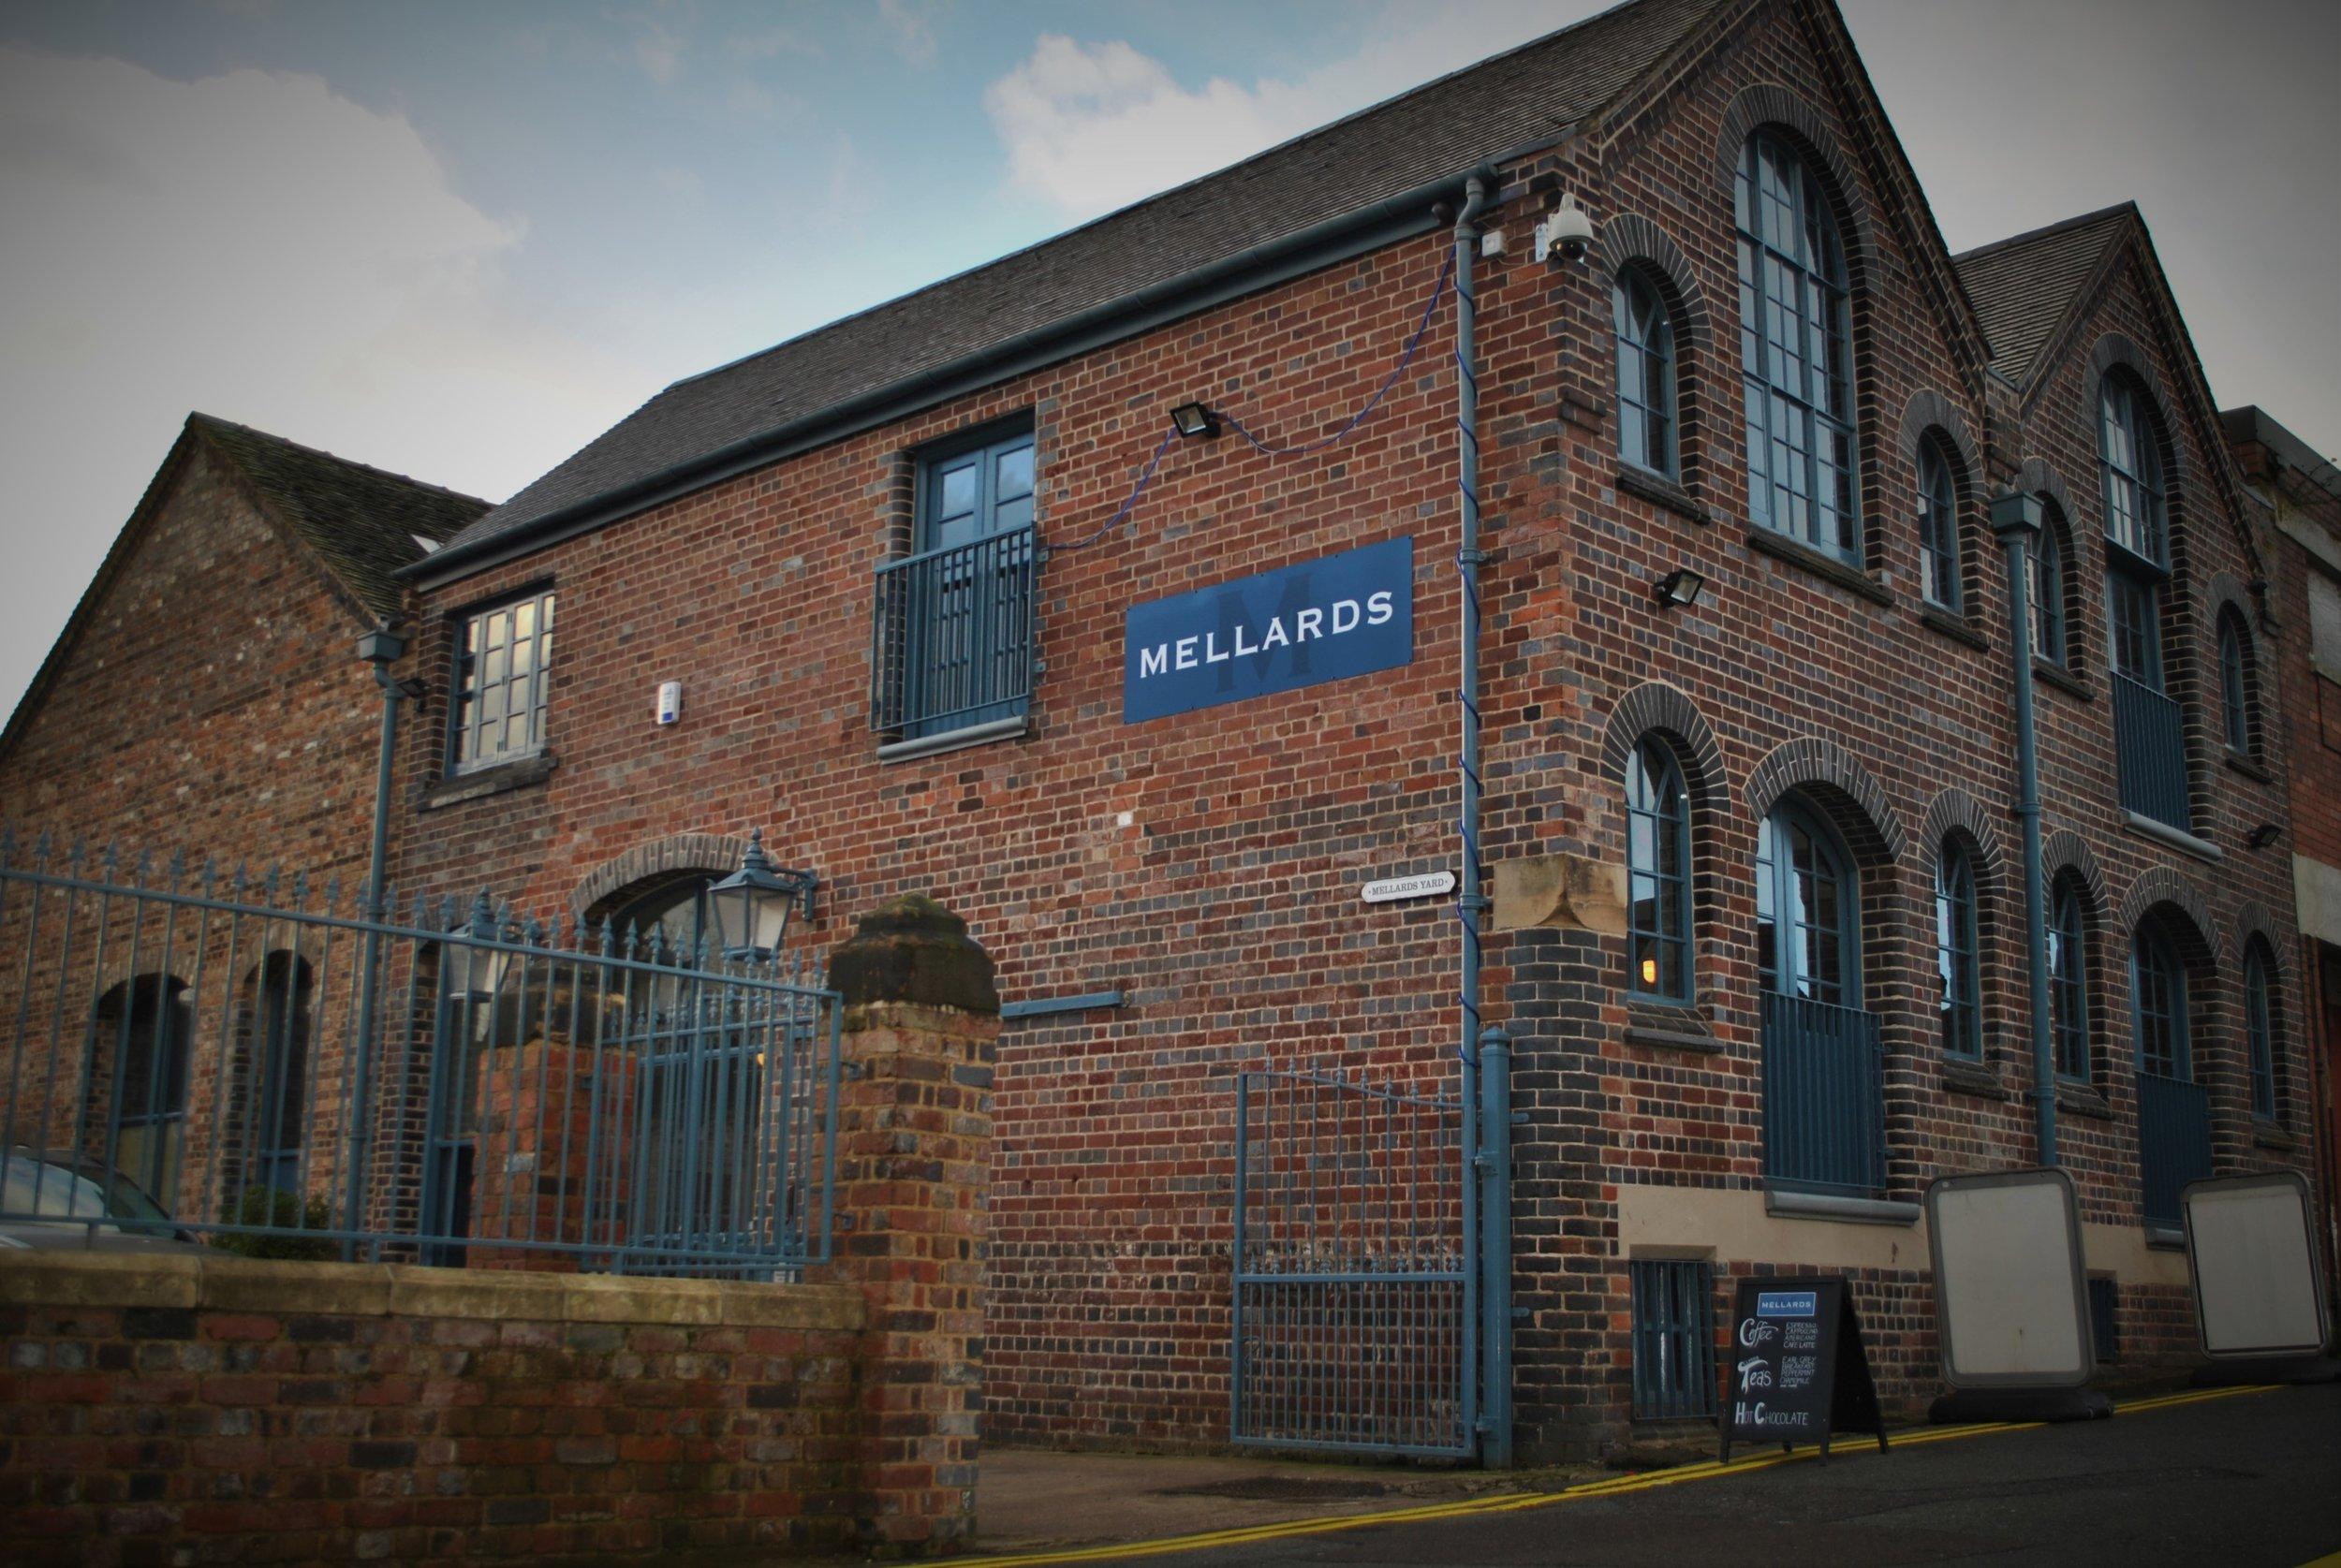 Mellards Bar, Newcastle under Lyme